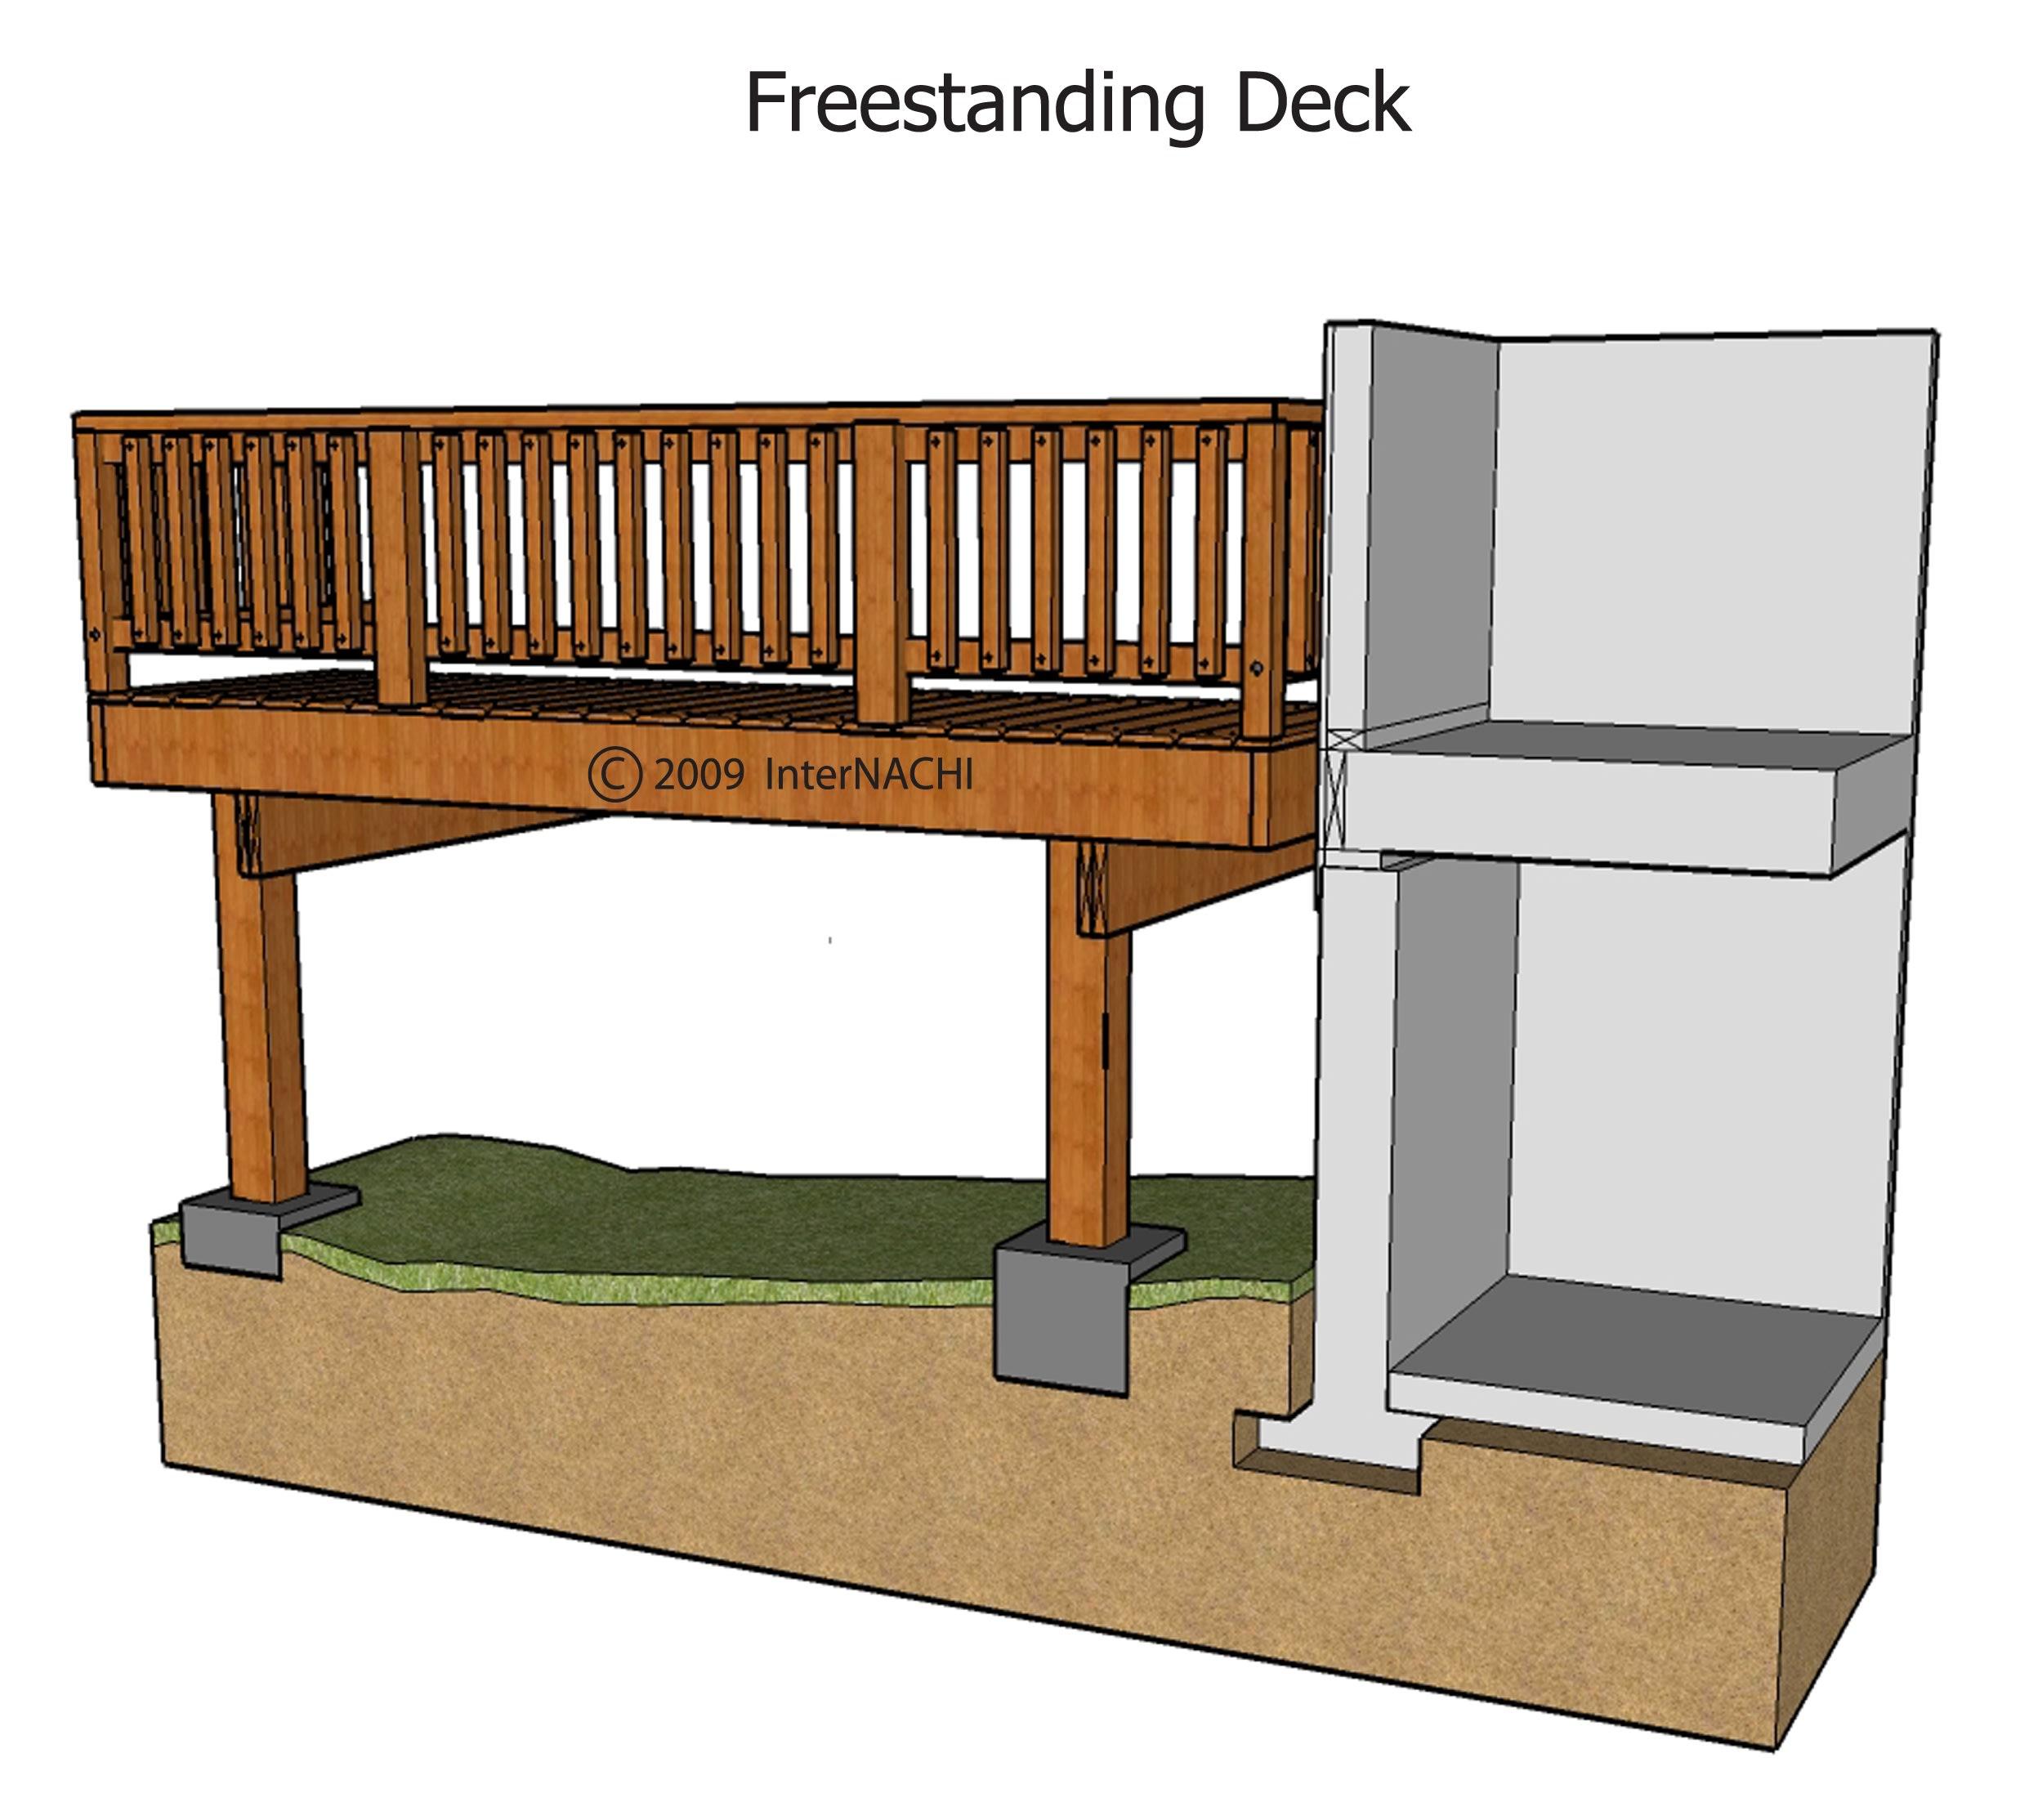 Freestanding deck.